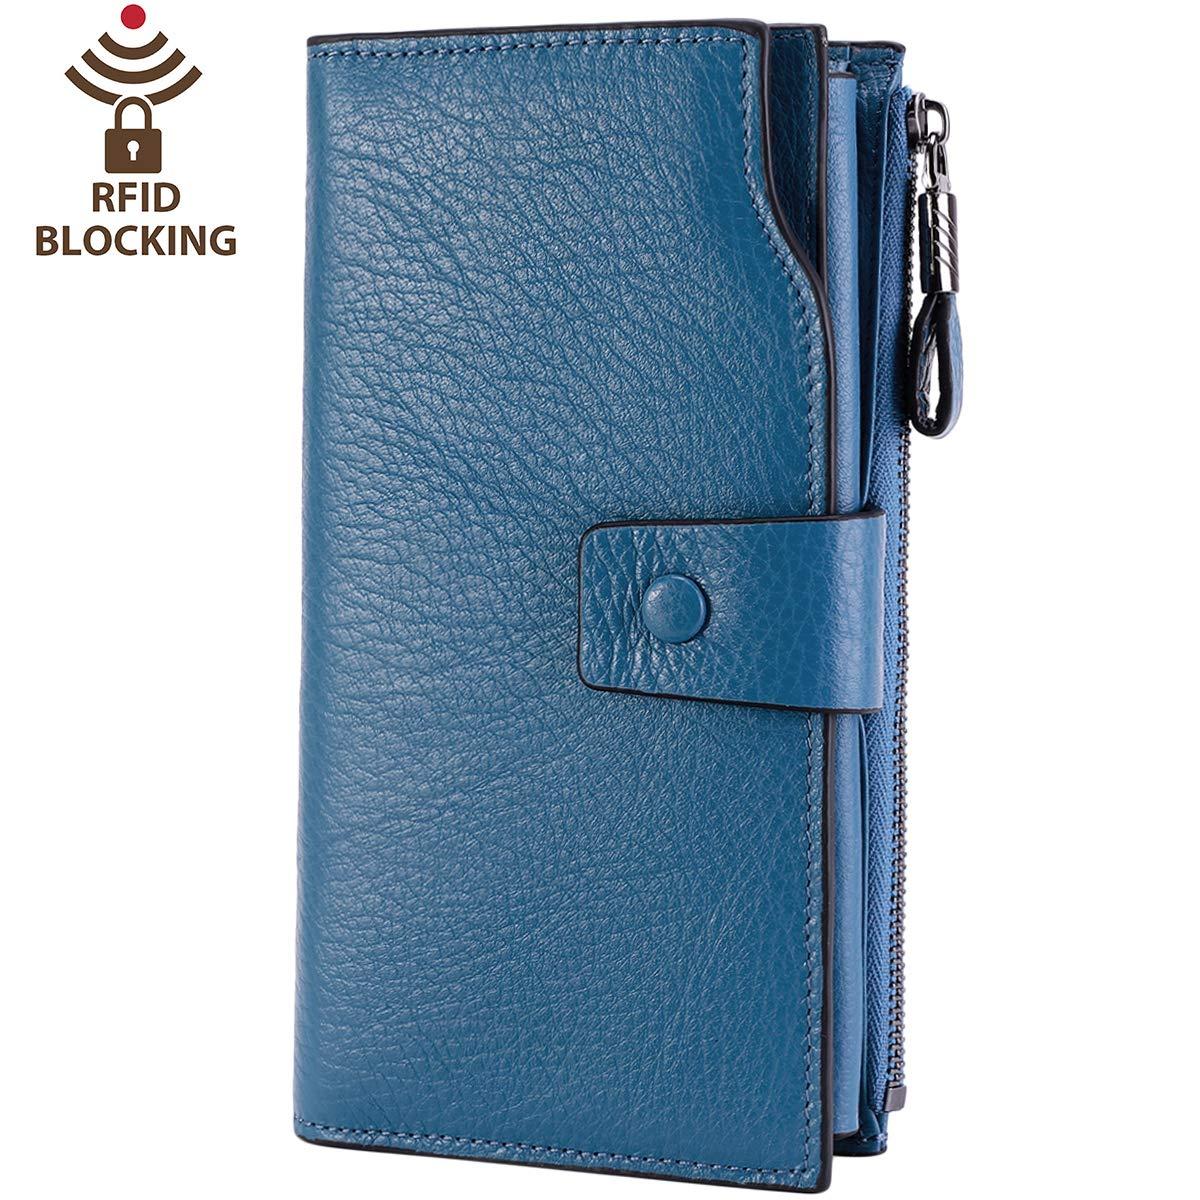 Itslife Women's RFID Blocking Large Capacity Luxury Wax Genuine Leather Clutch Wallet Card Holder Organizer Ladies Purse (2-Natural Sky Blue)